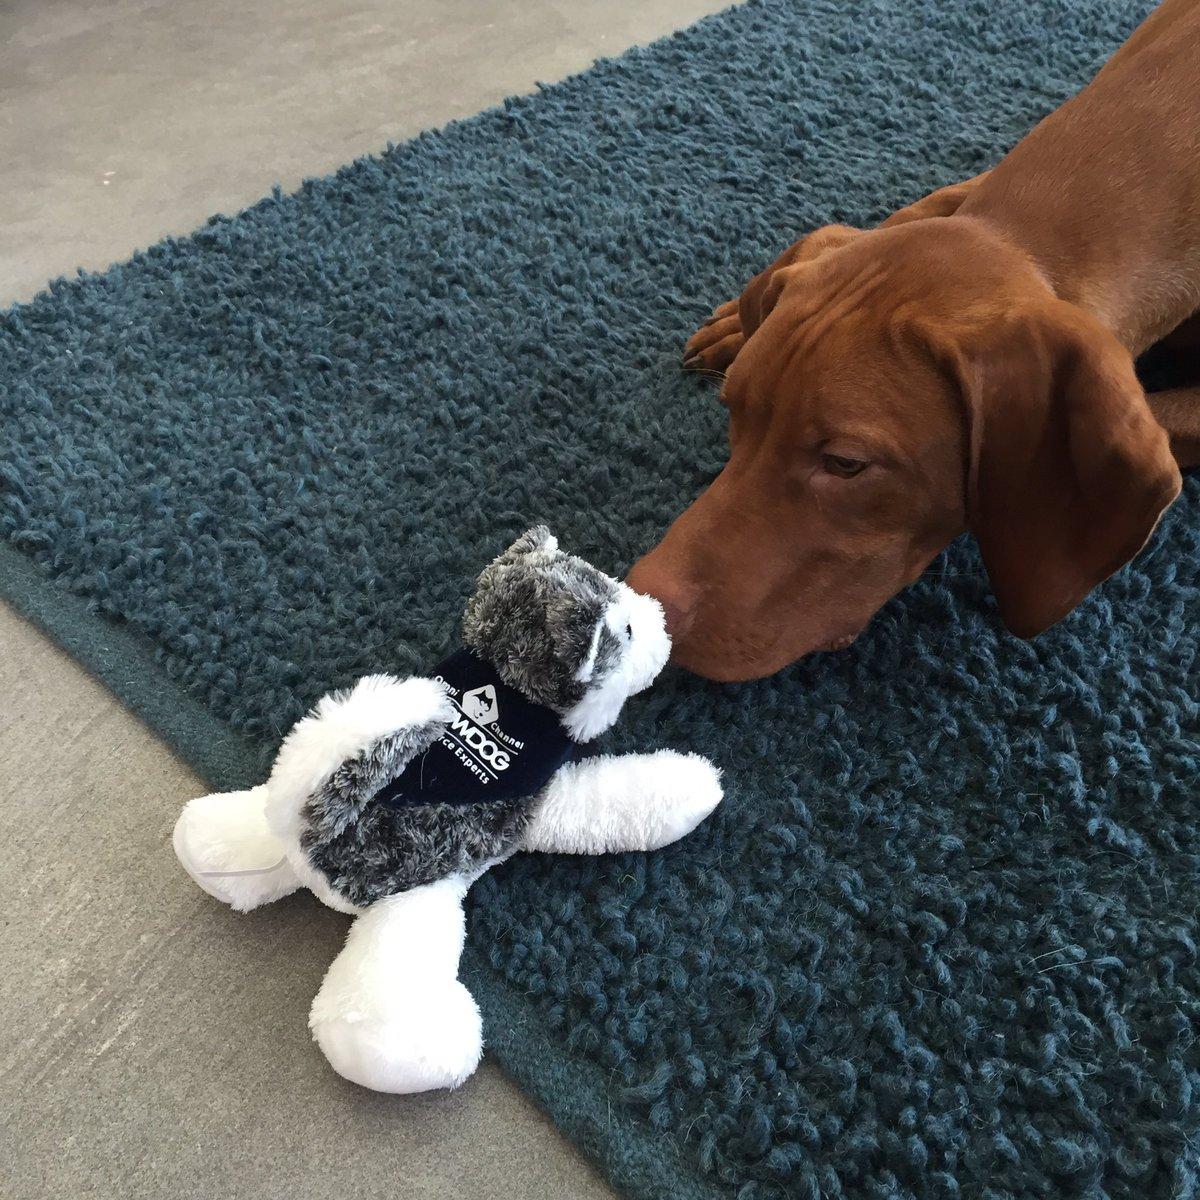 markabrinton: . @SnowdogApps thanks for the Snowdog, my dog is not sure what to think #MagentoImagine https://t.co/JhURdNtkAz